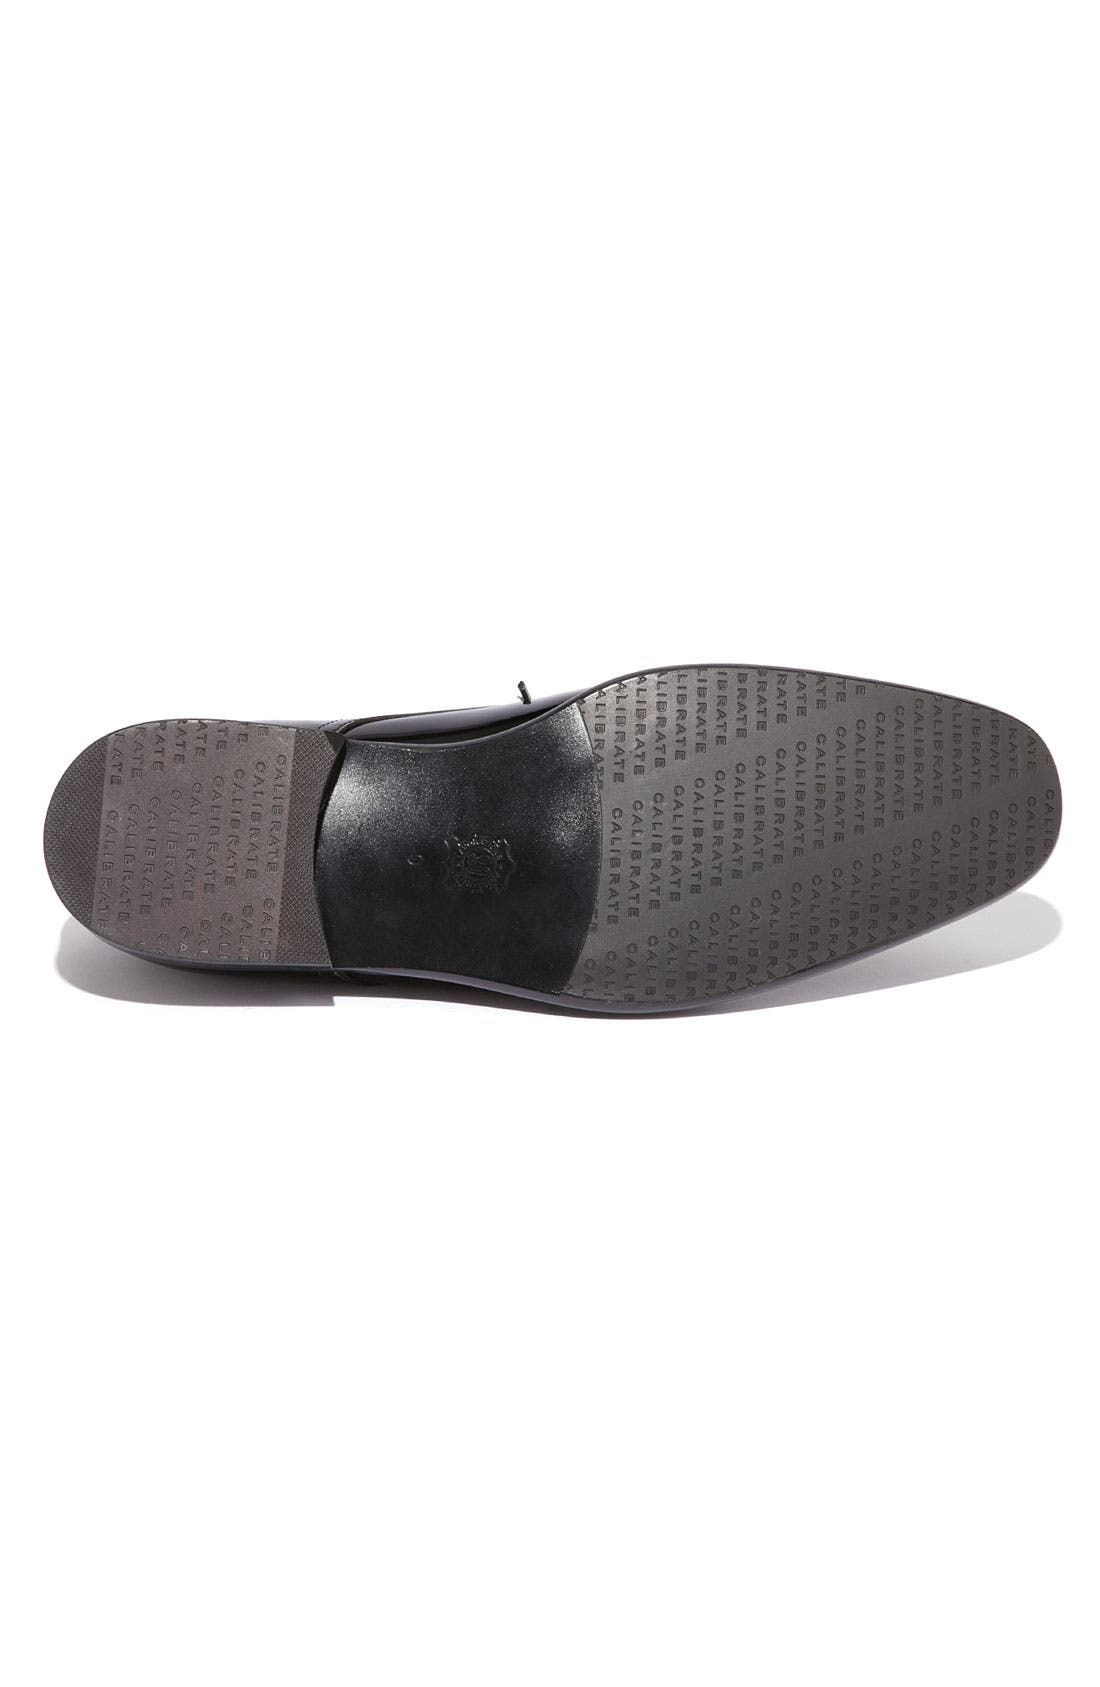 Alternate Image 4  - Calibrate 'Oscar' Patent Leather Dress Shoe (Men)